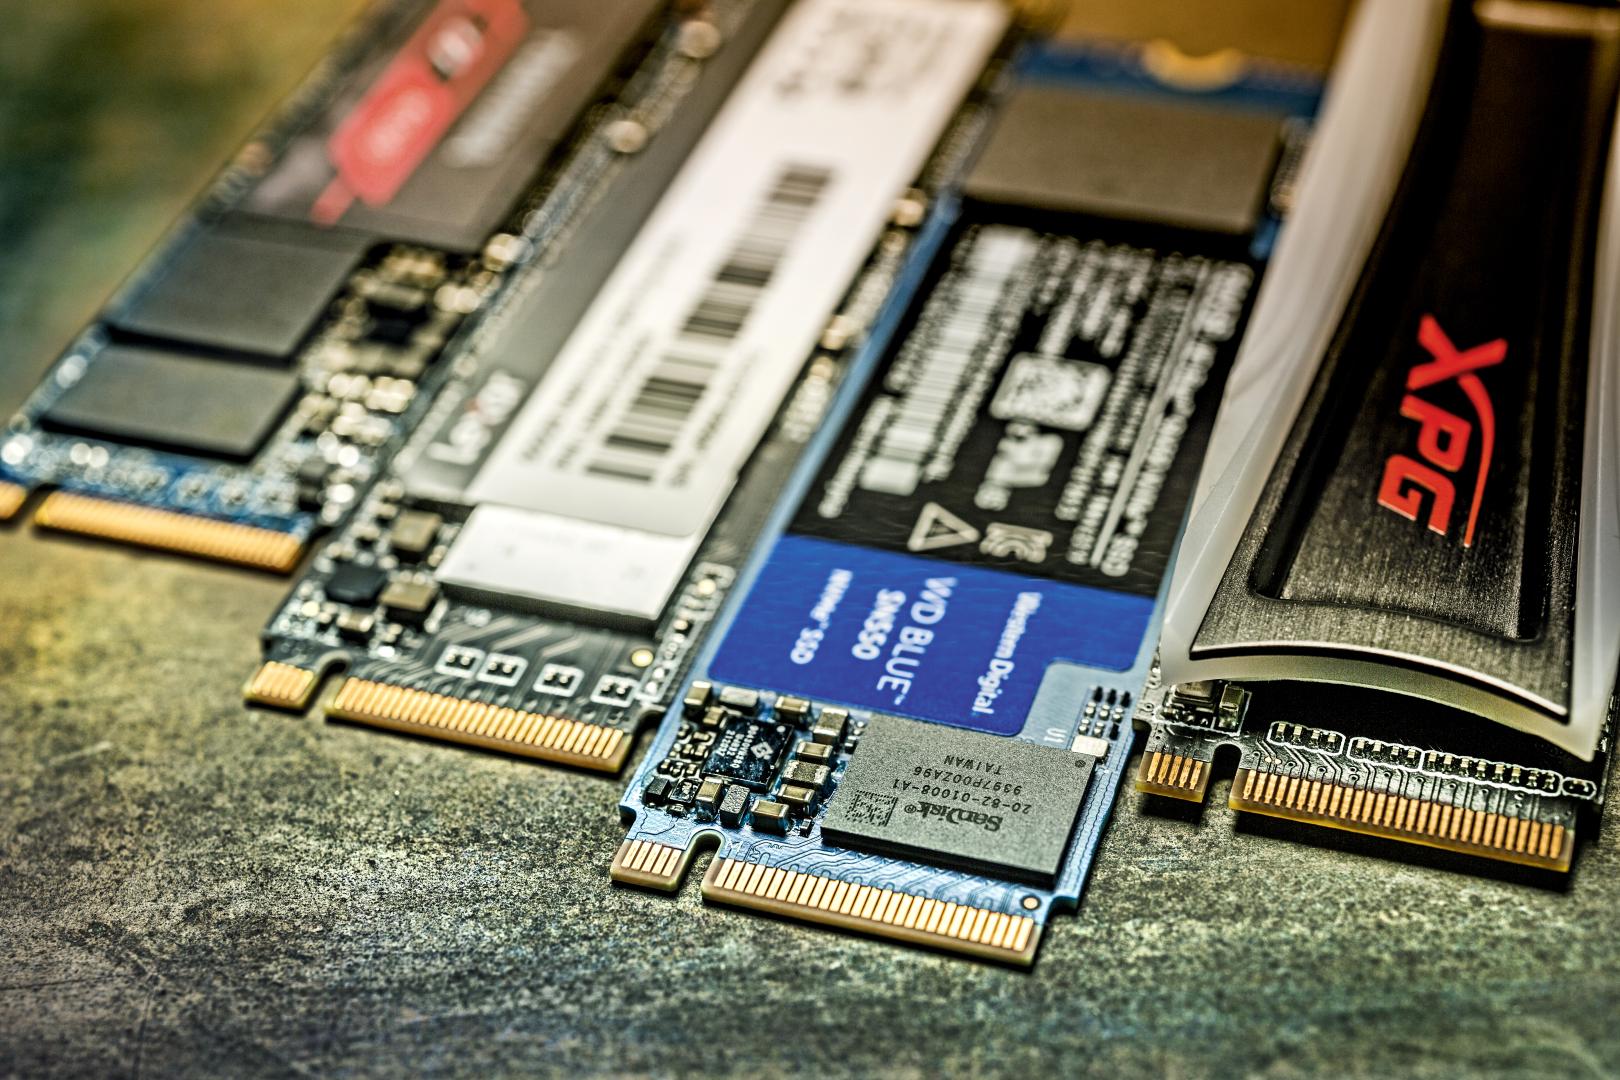 NVMe ssd PCIe 3.0 500 GB review test vergelijking benchmark warmte snelheid